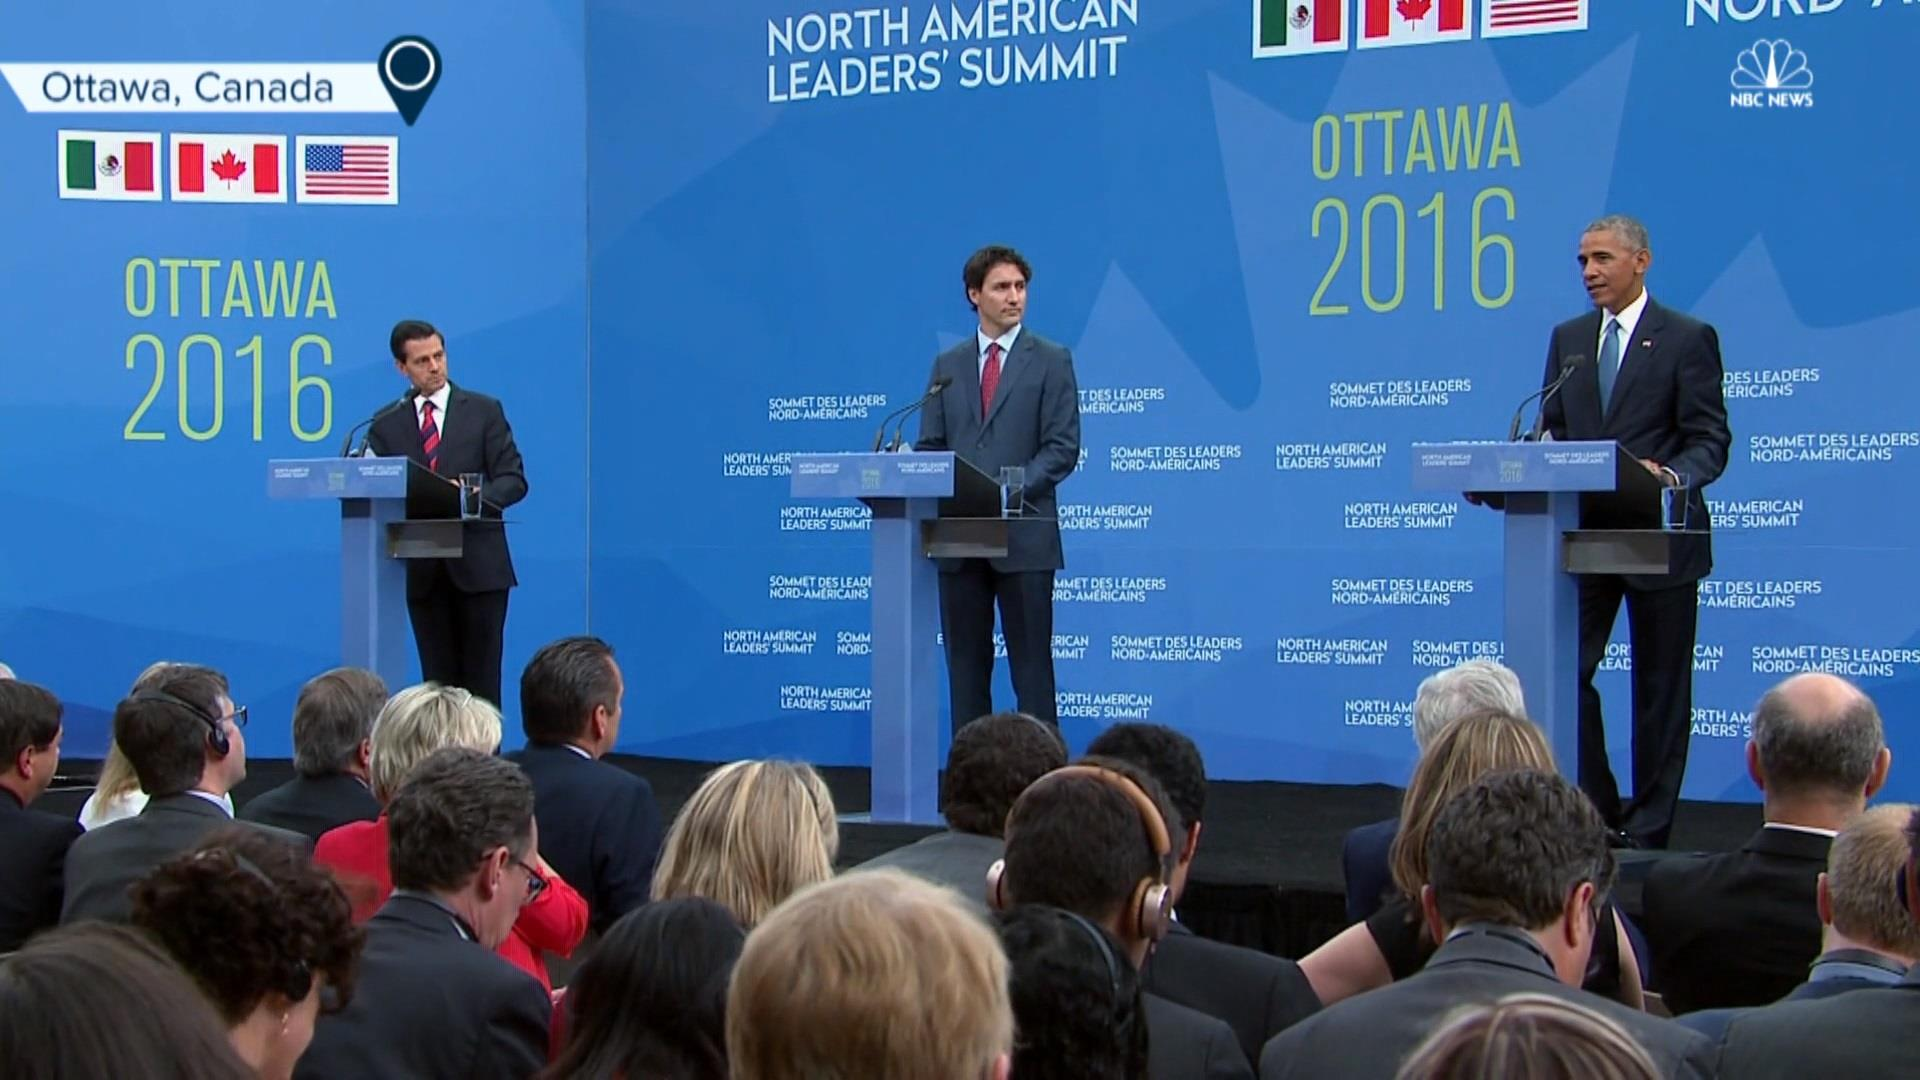 Trudeau, Obama discuss North American unity